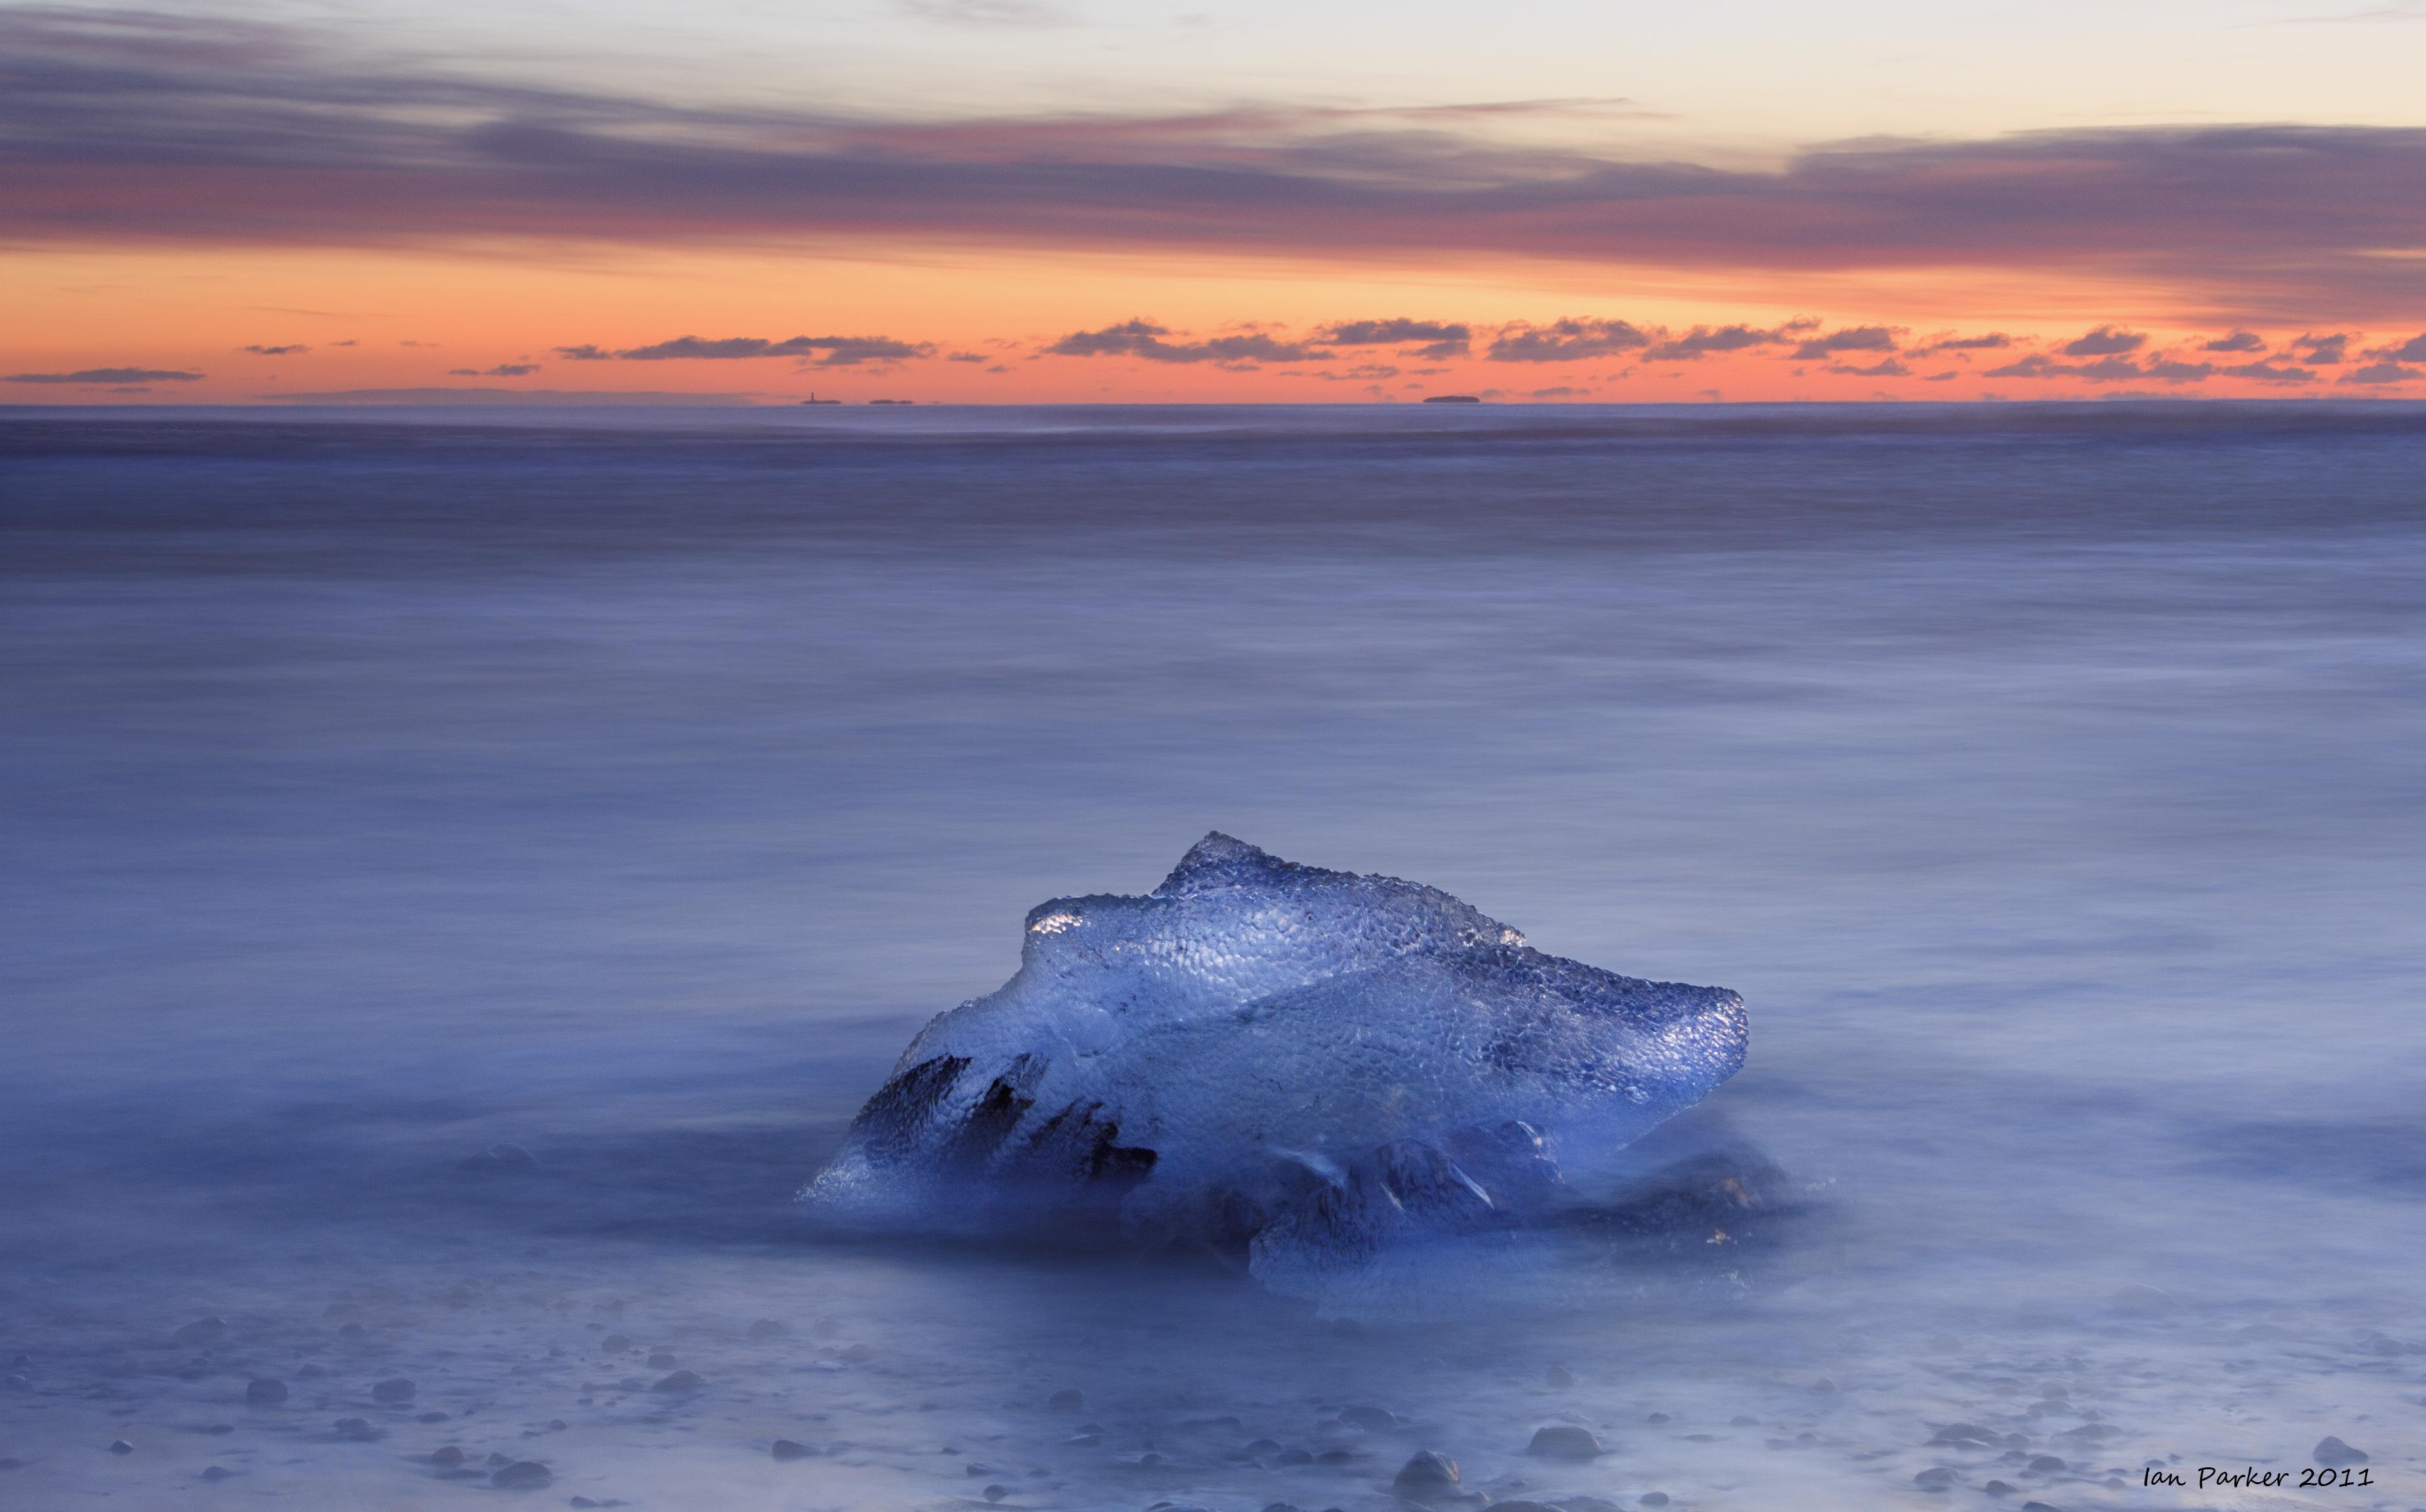 Evanescent Light : Iceland - Sea